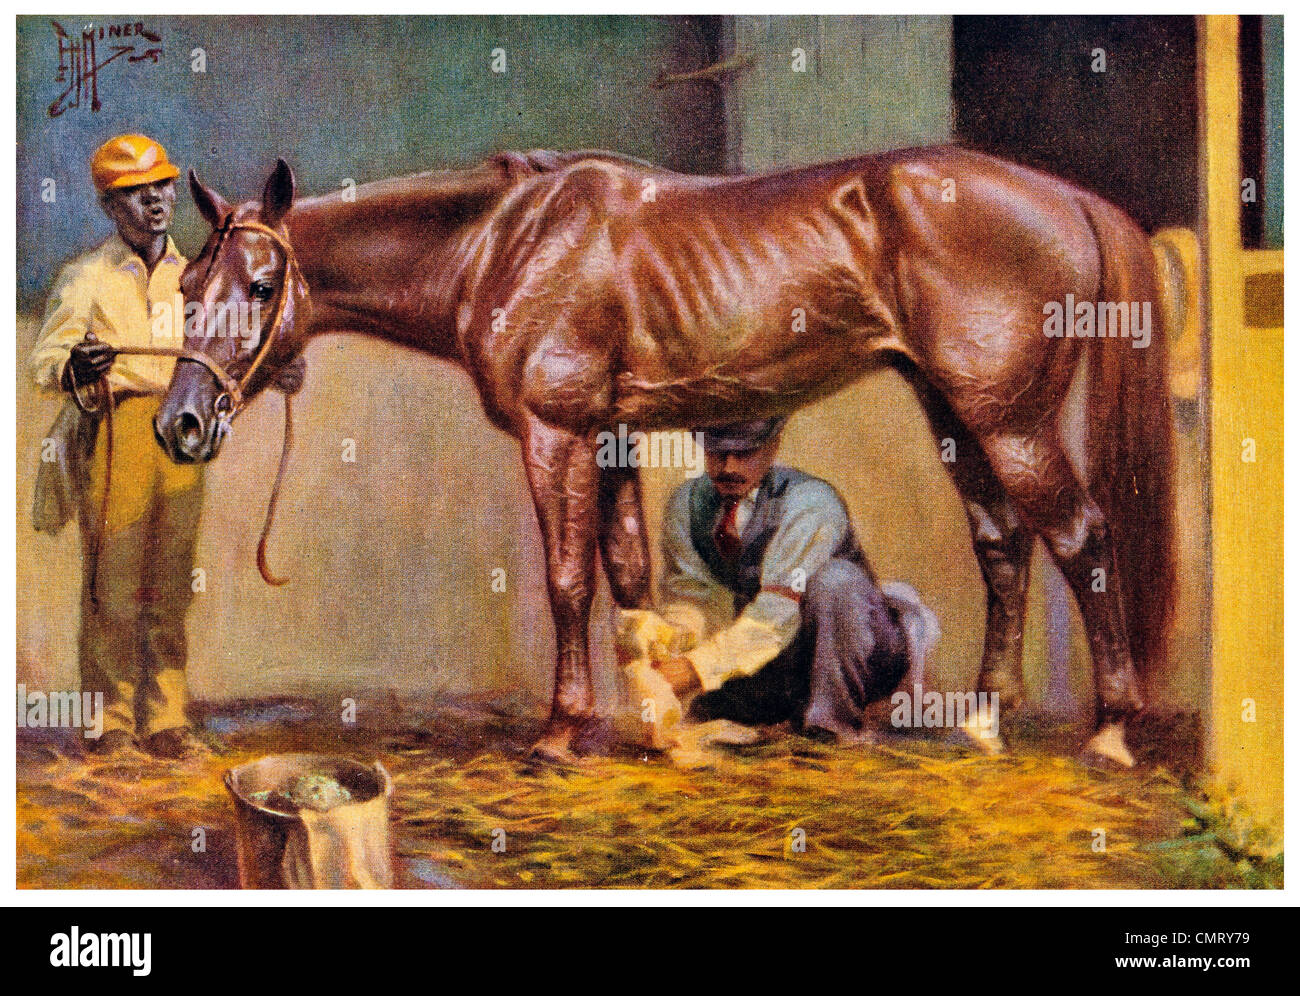 1923 Standard Bred Horse - Stock Image